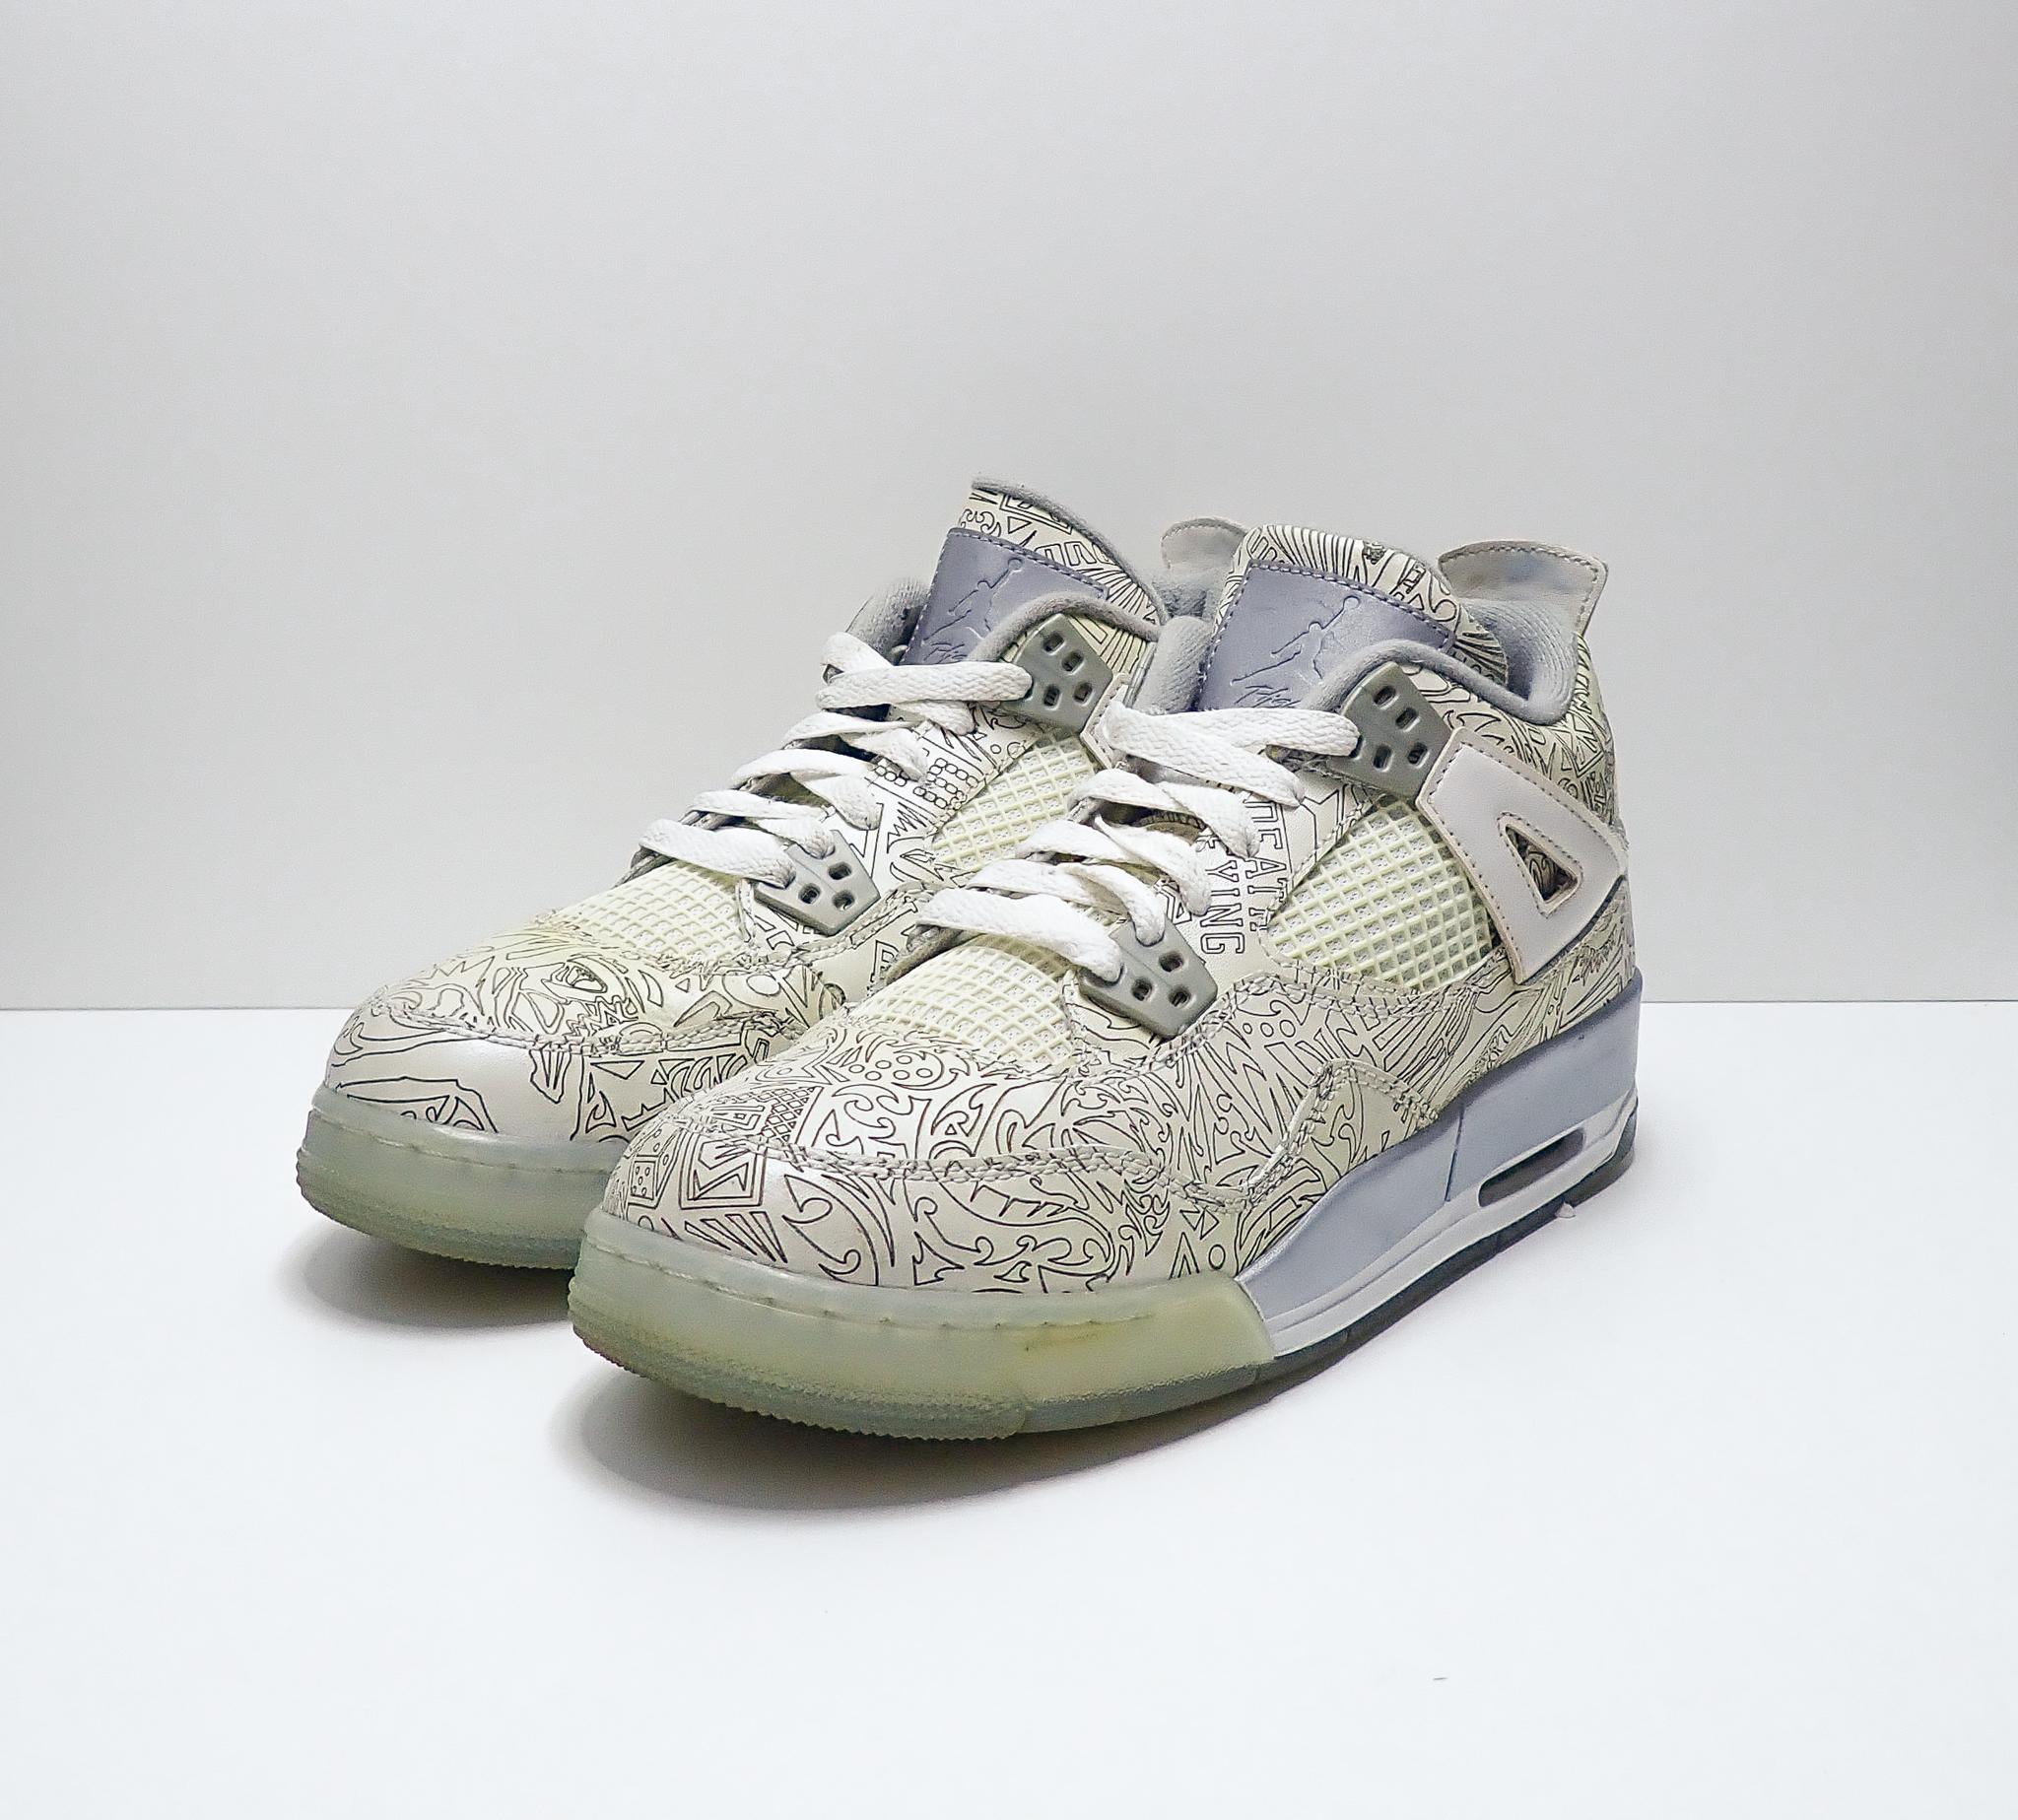 Jordan 4 Retro Laser (GS)